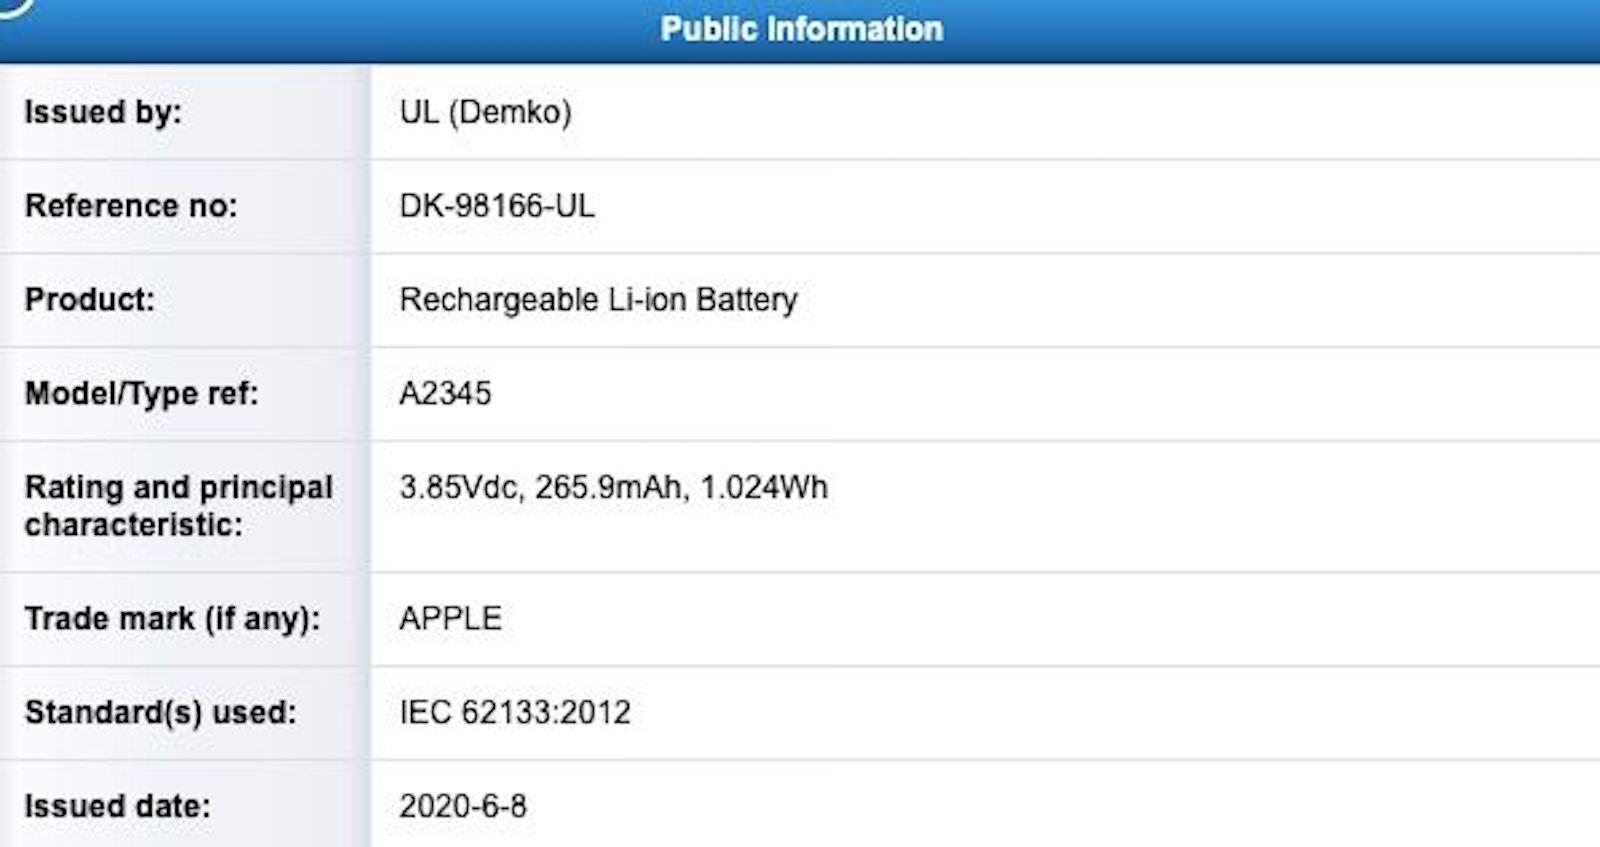 Apple A2345 UL Demko